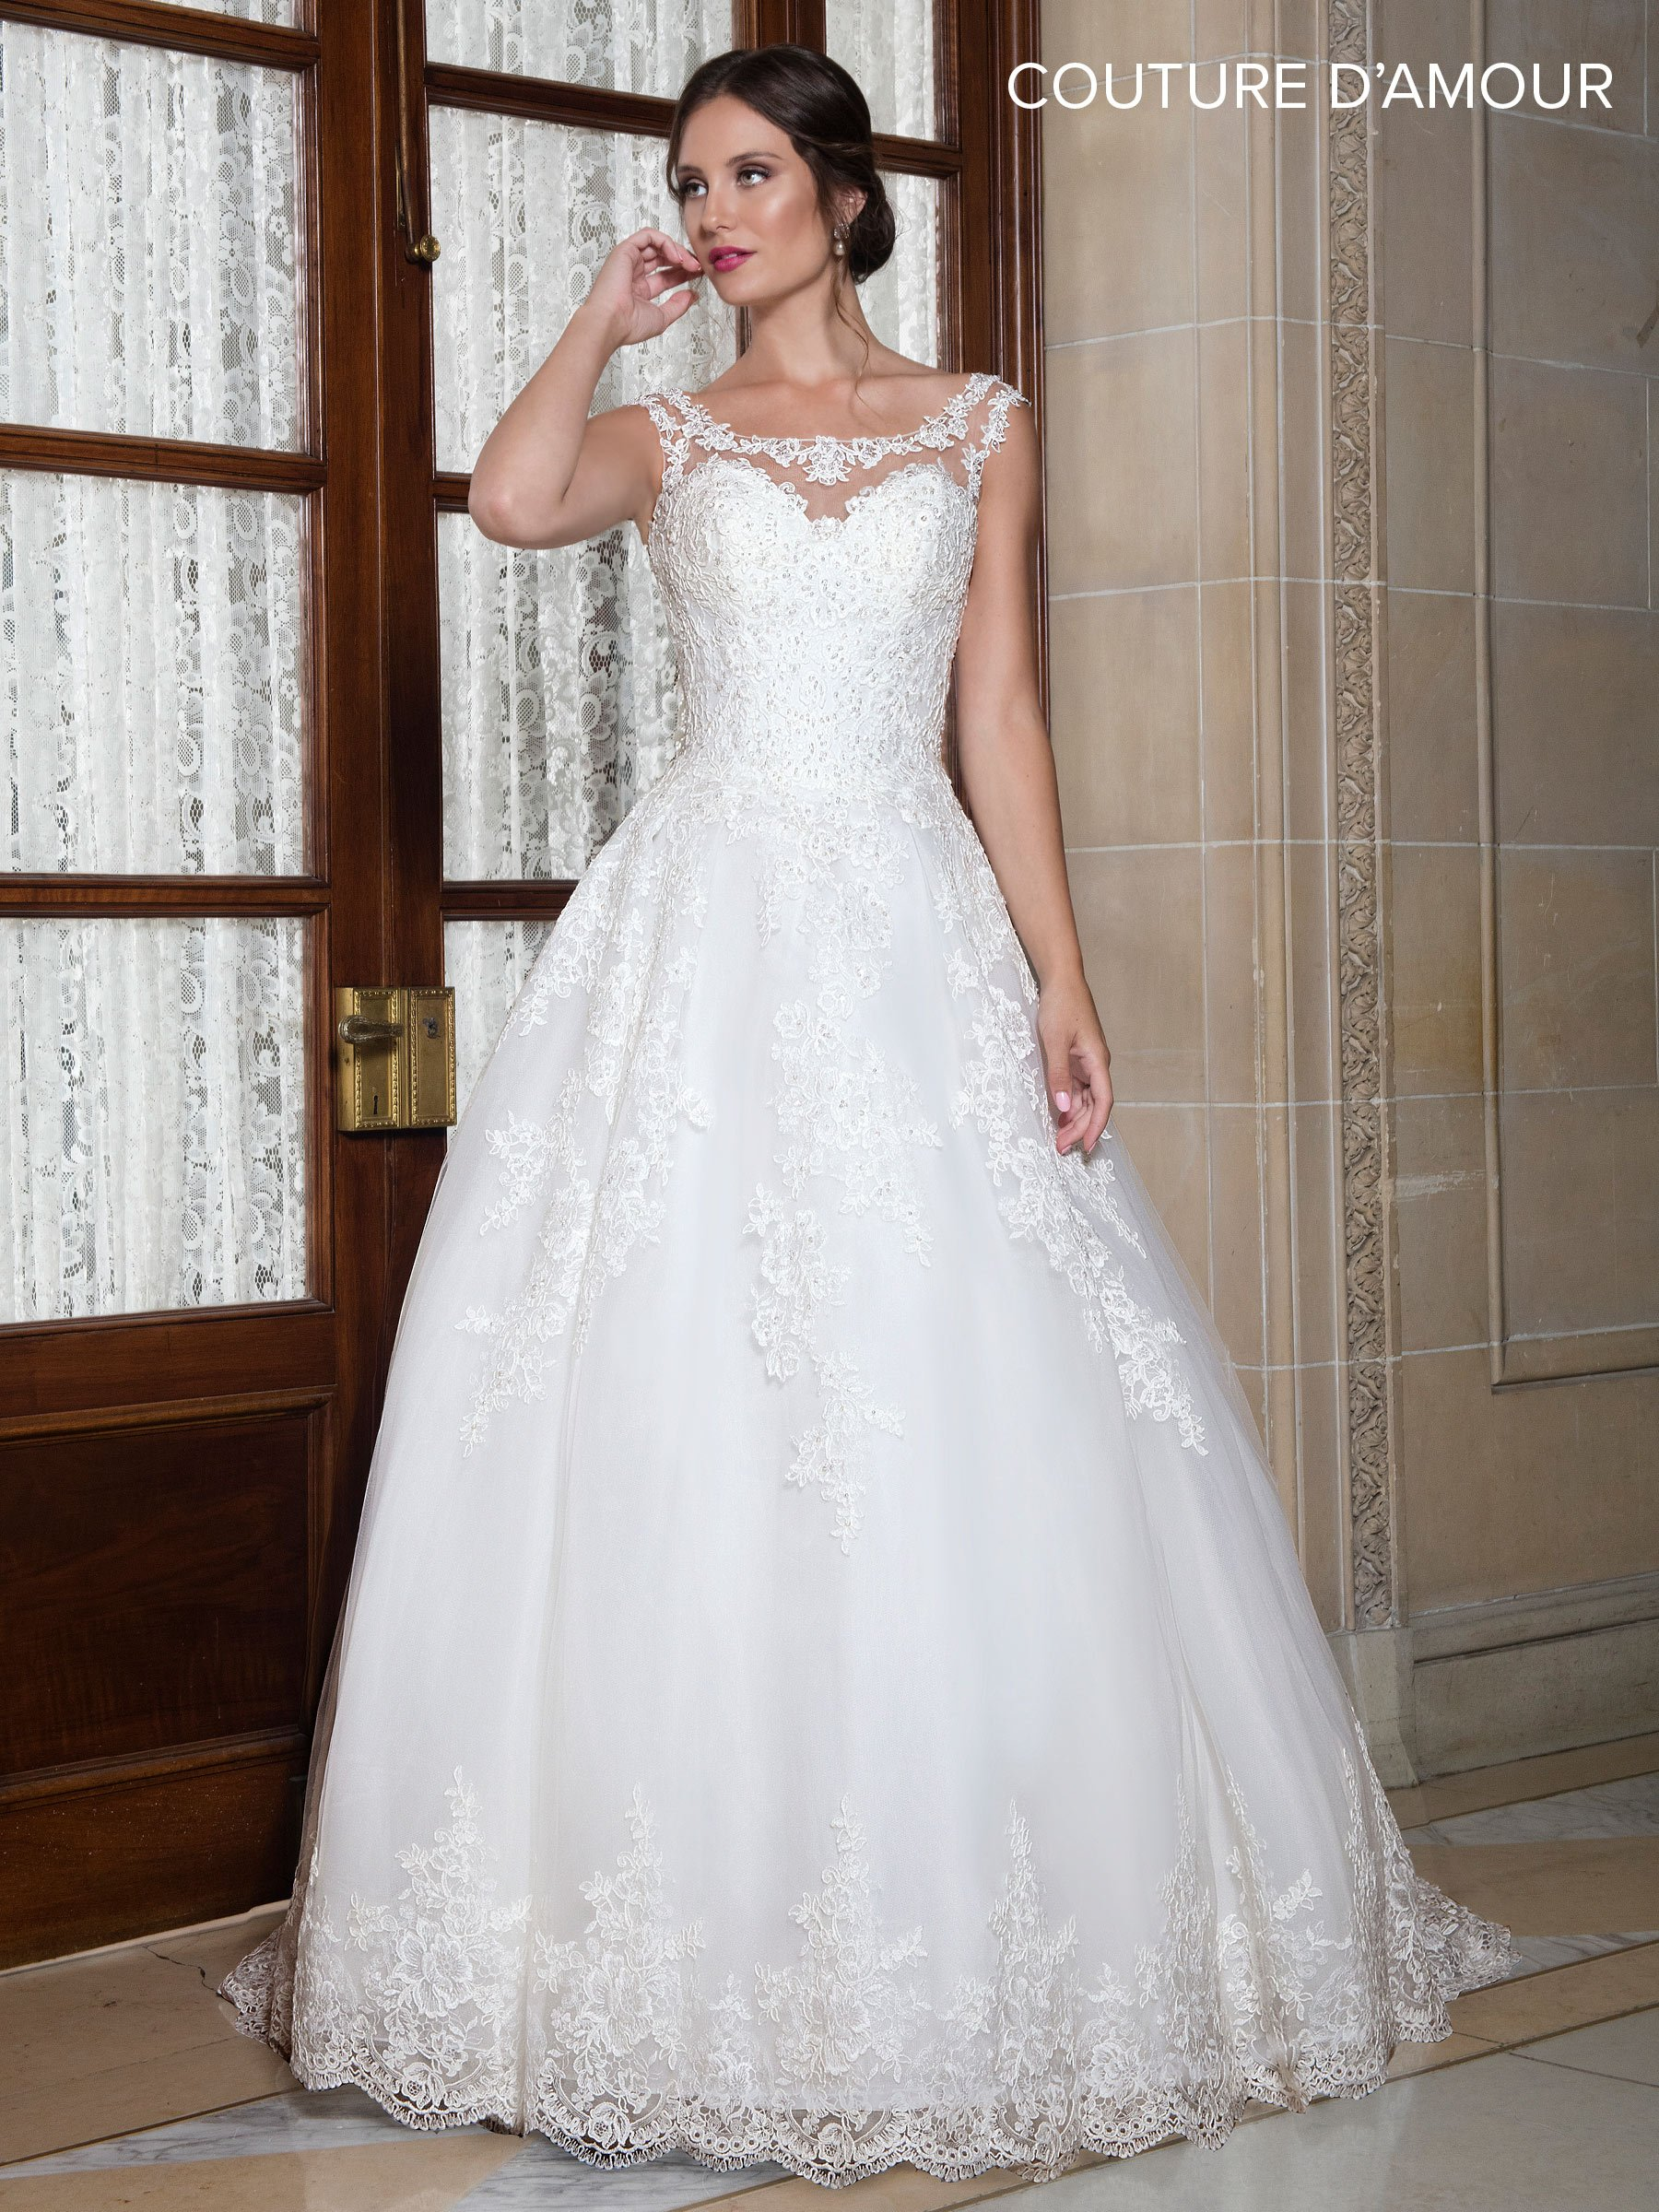 Illusion lace wedding dress  Scoop Neck Illusion Lace Wedding Dress by Maryus Bridal MB in